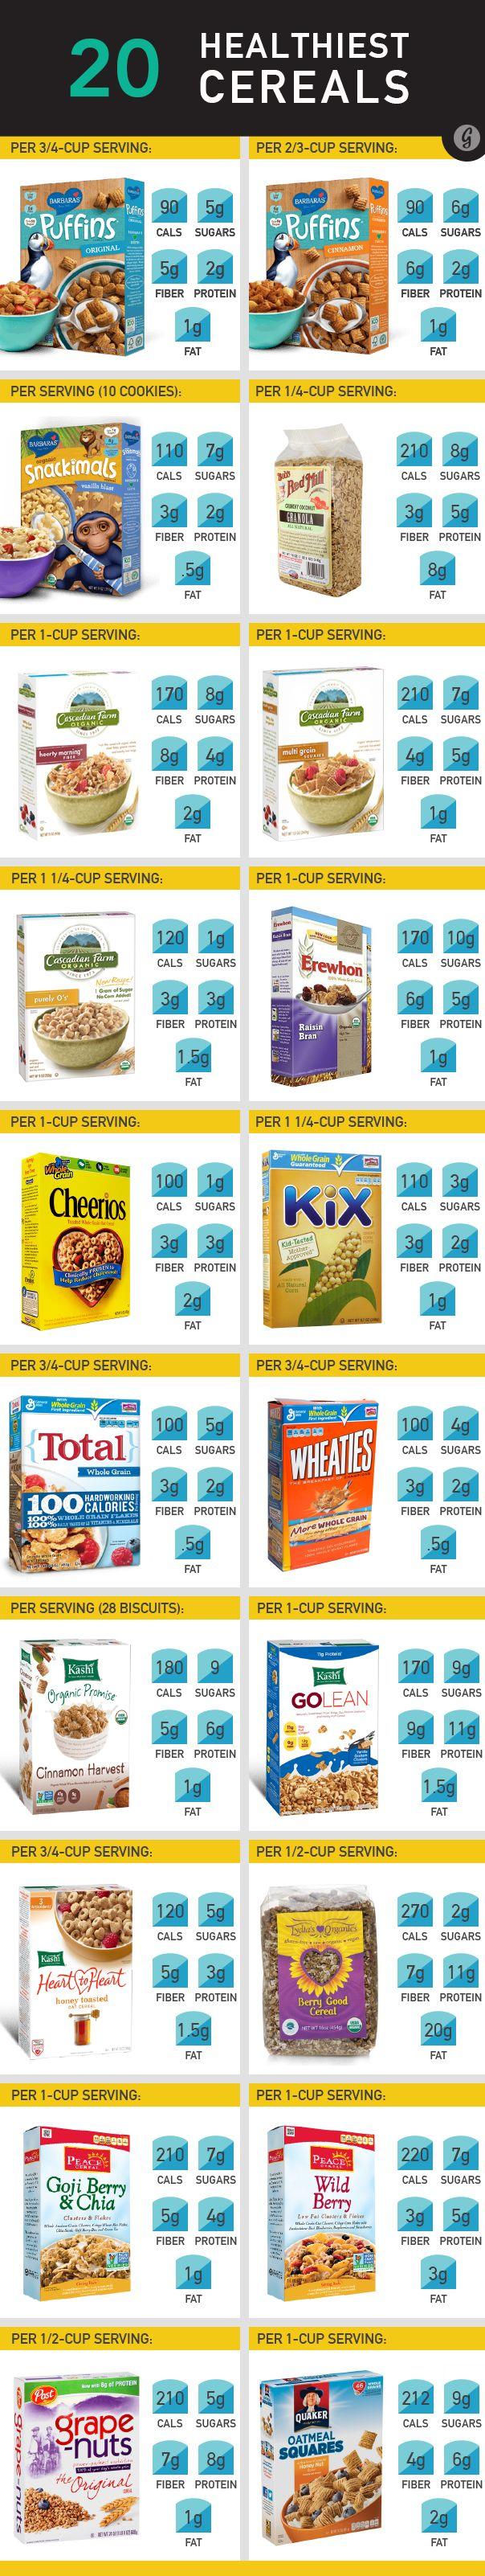 The 20 Healthiest Cereals